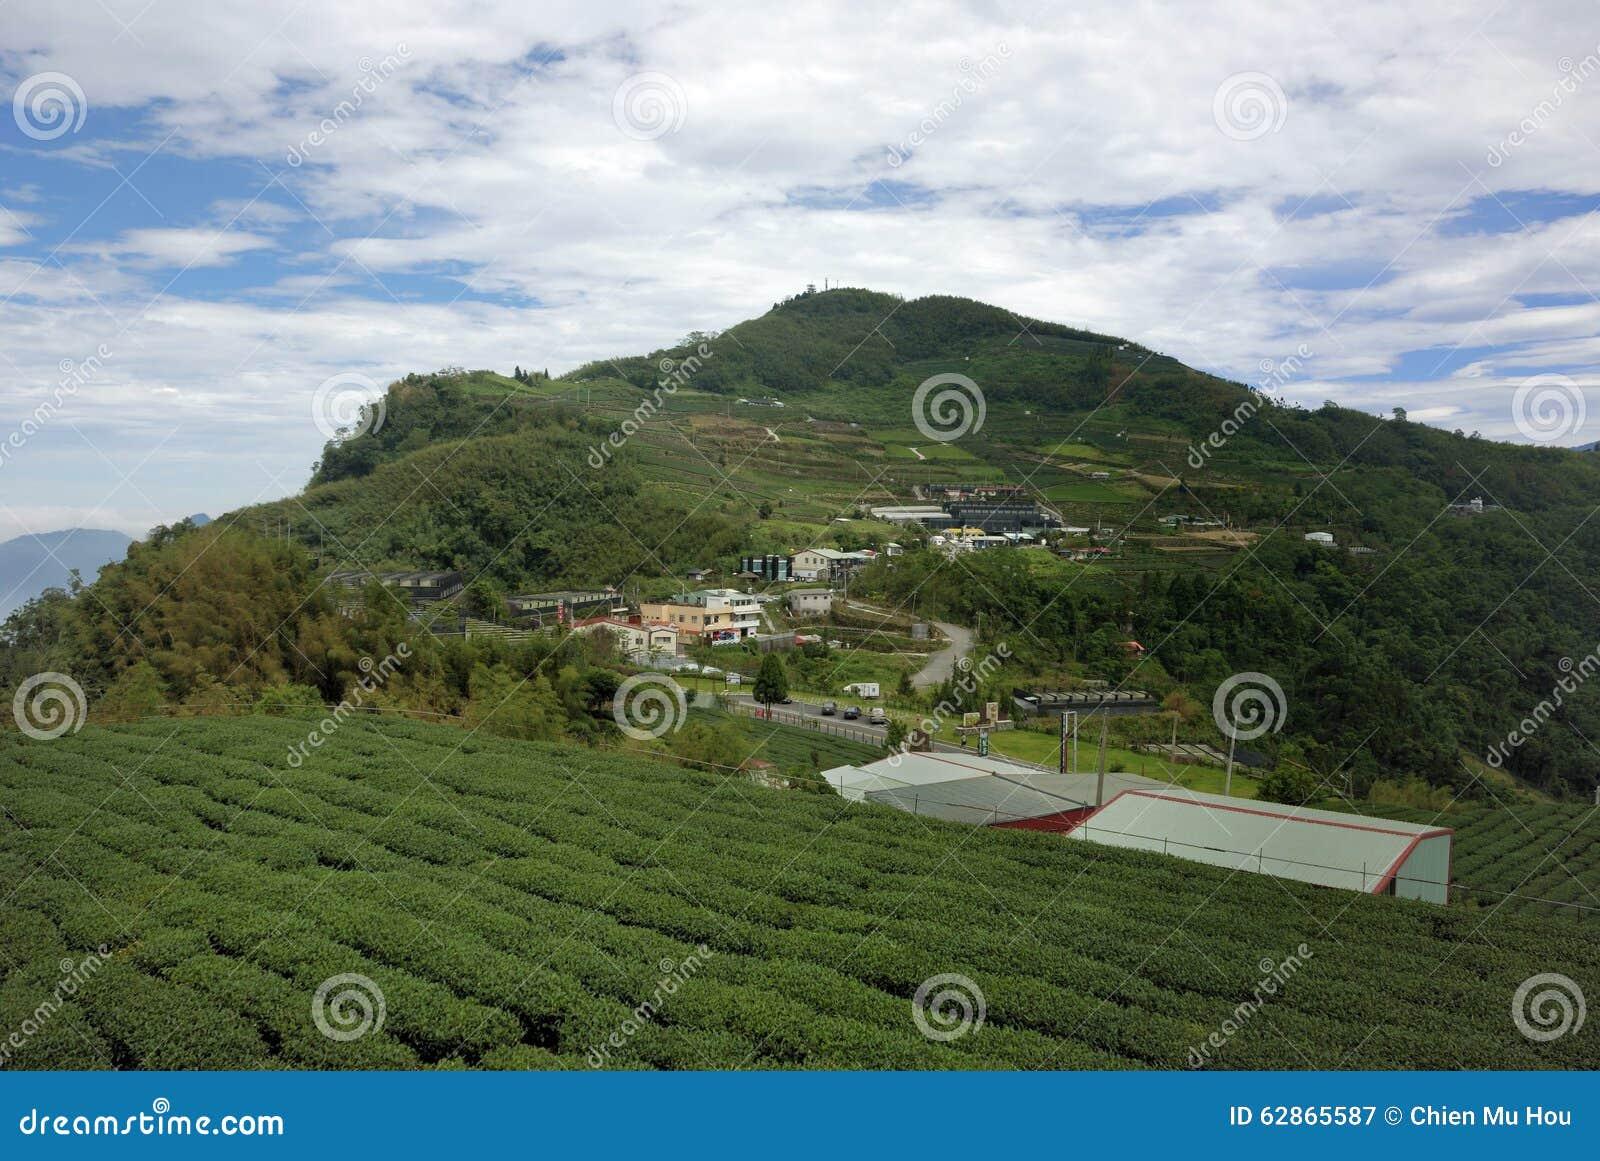 A Li Mountain Oolong Tea Editorial Photography